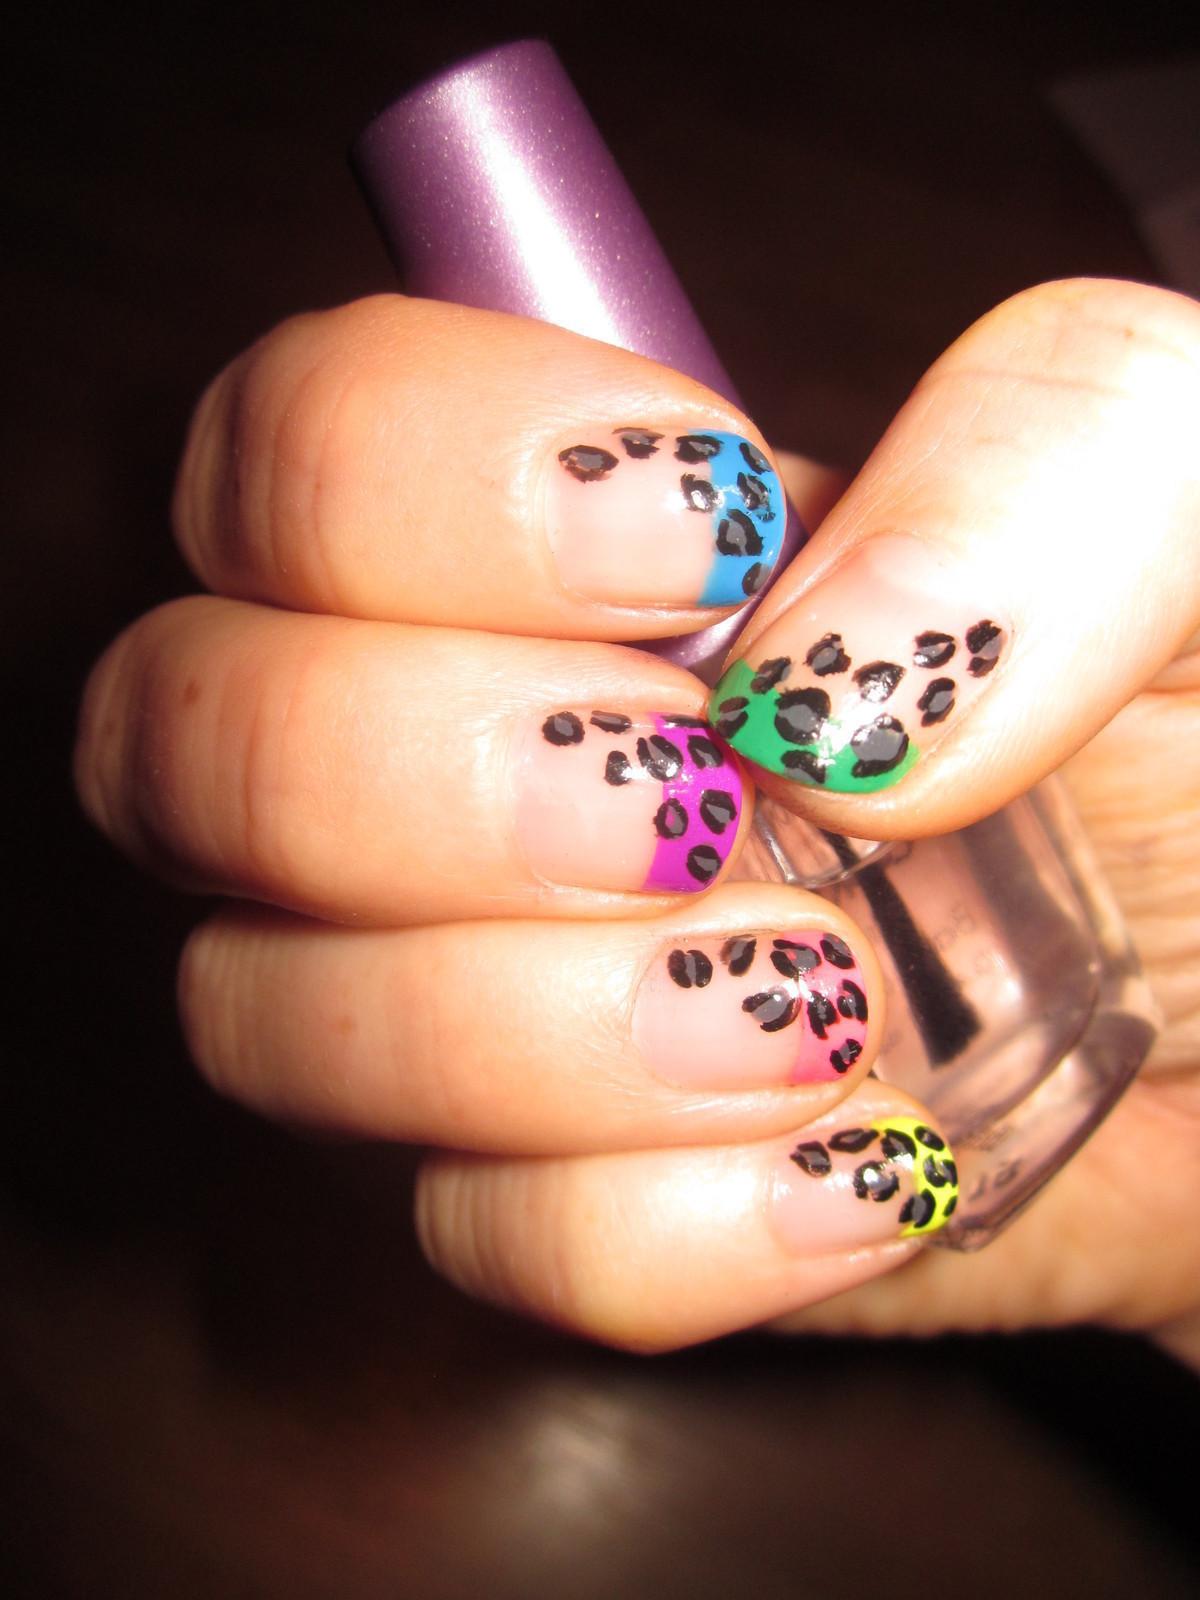 Nail Art Coloured Tips With Leopard Print An Animal Nail Art